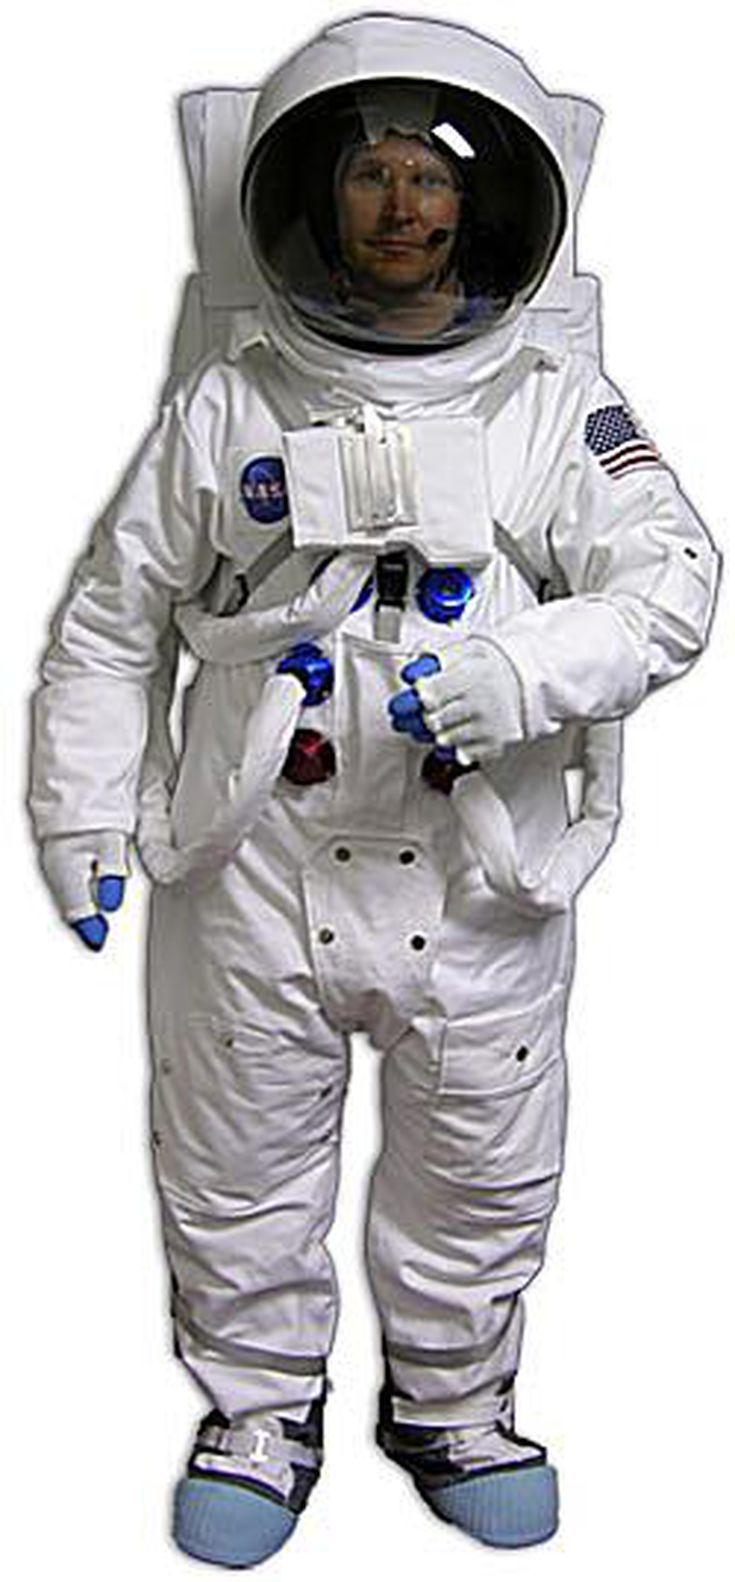 best 25 astronaut costume ideas on pinterest kids astronaut costume astronaut costume diy. Black Bedroom Furniture Sets. Home Design Ideas